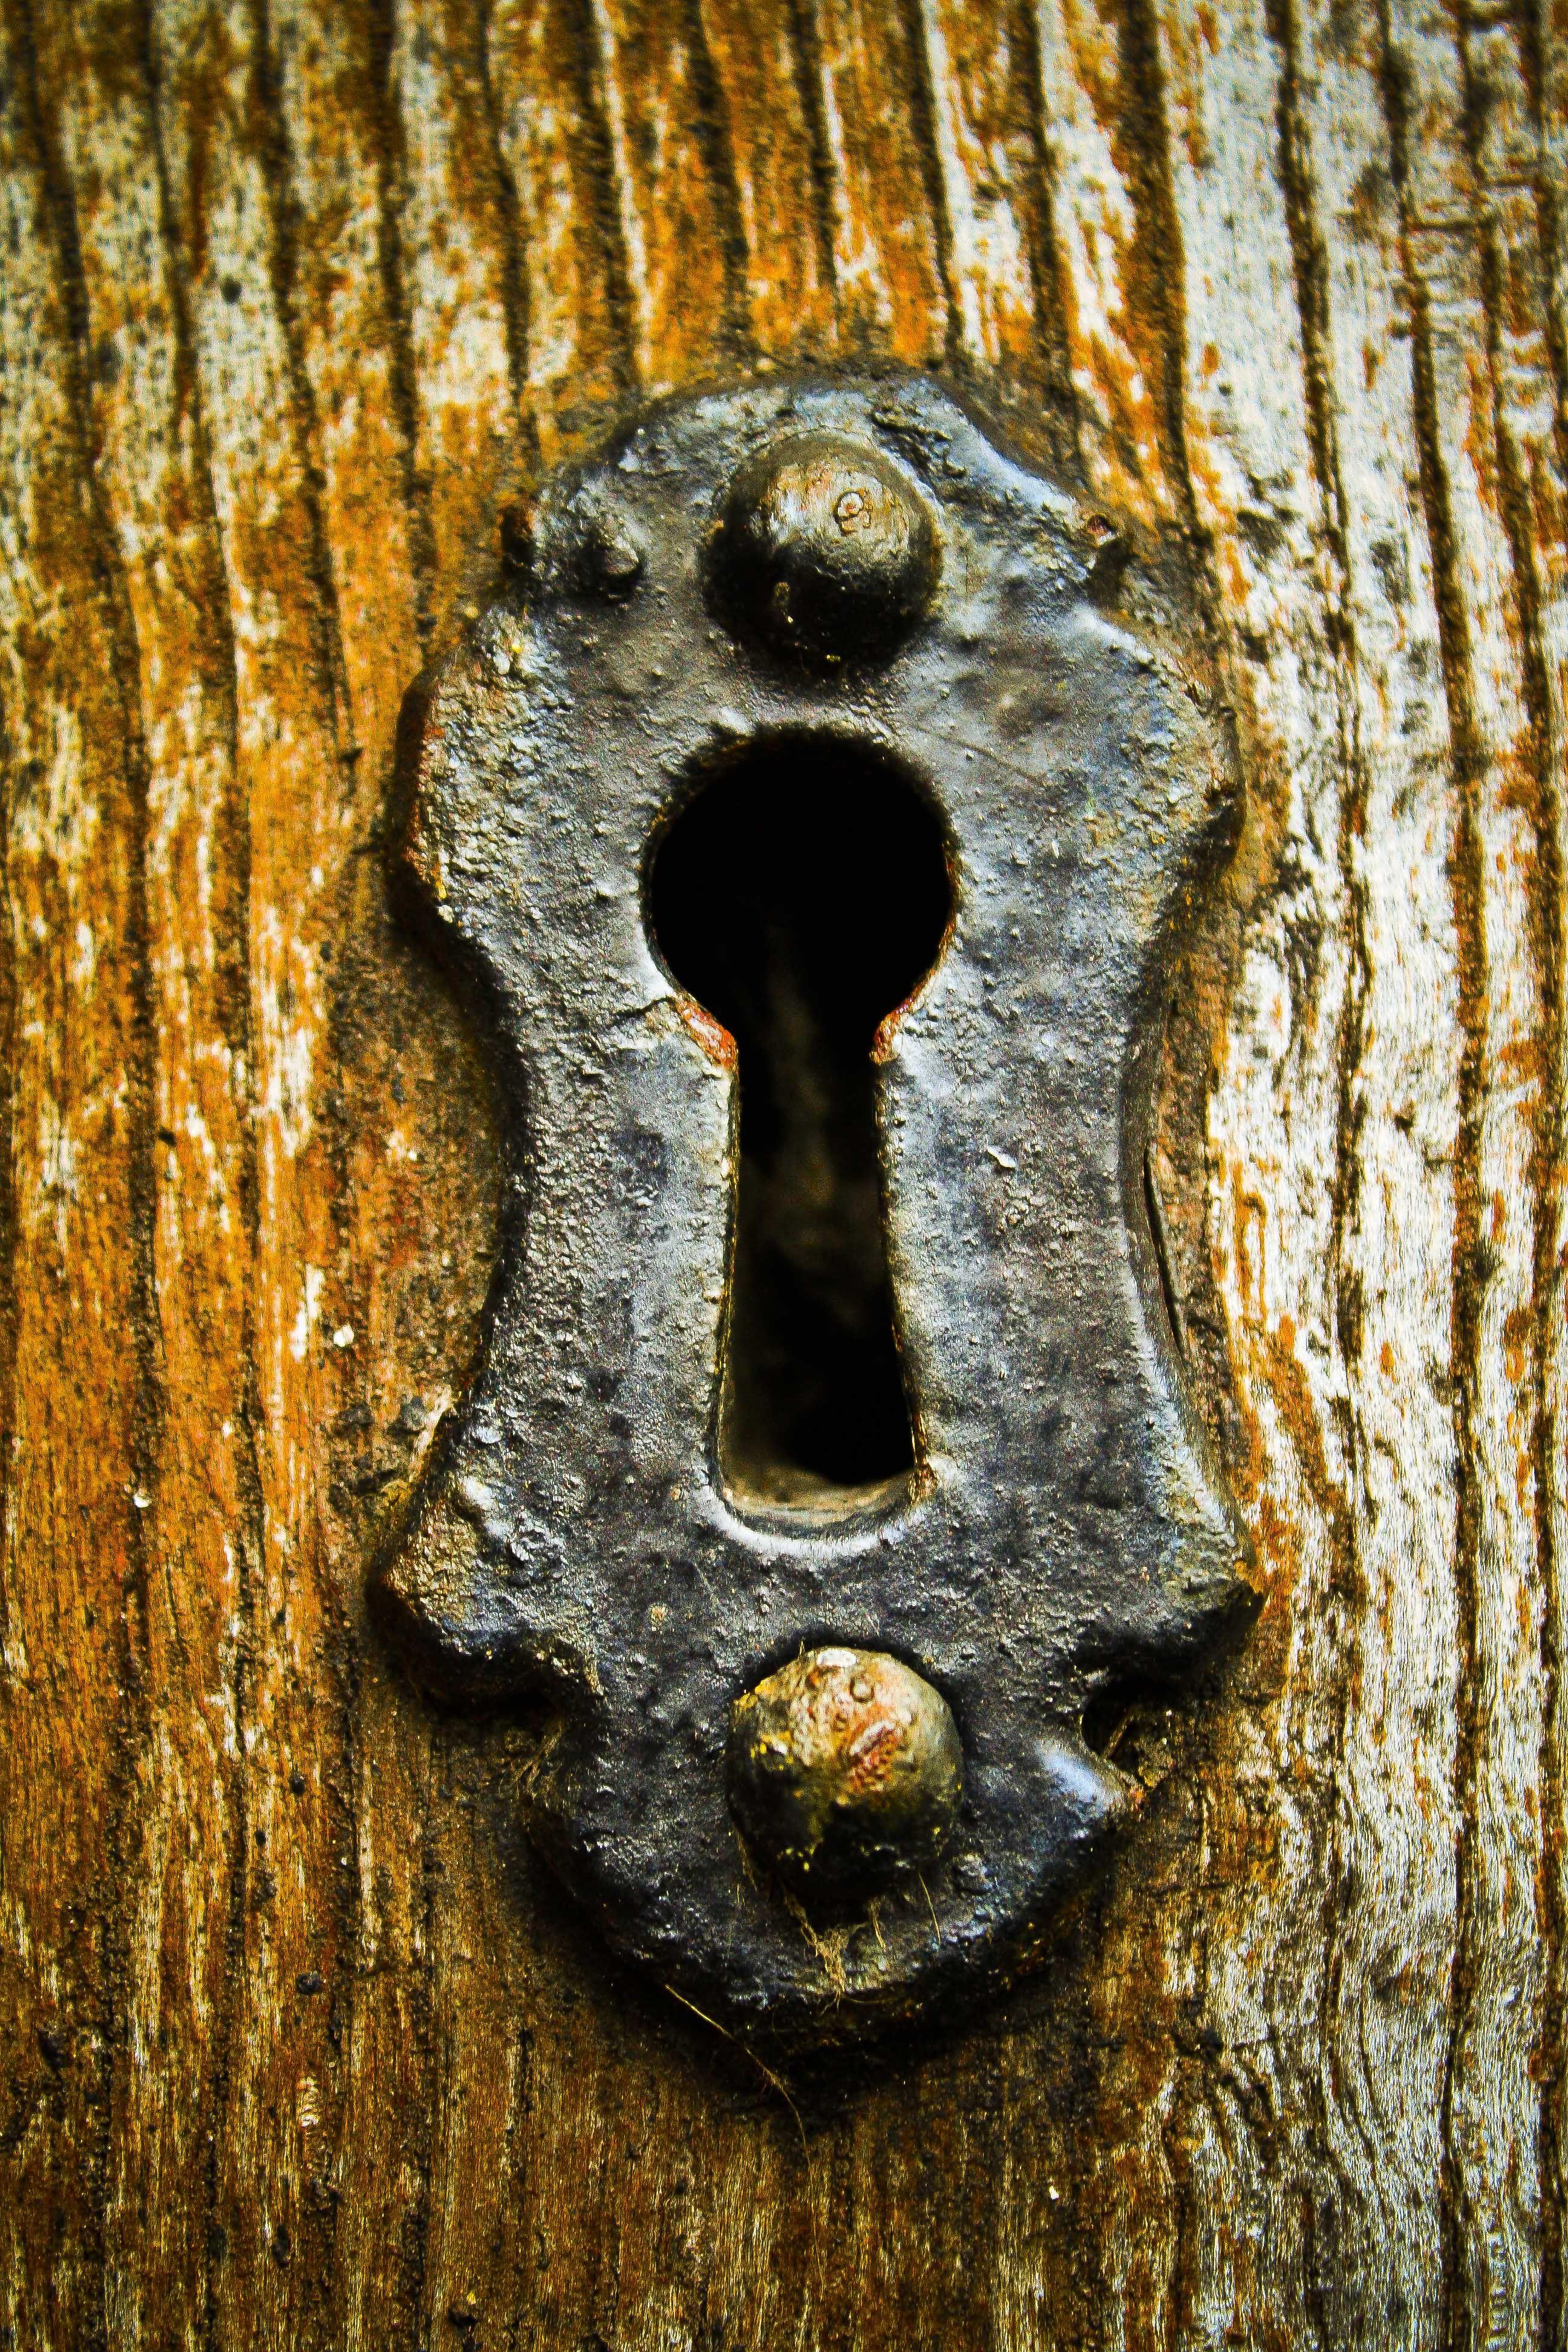 keyhole - Google Search | Personal geo | Pinterest | Doors